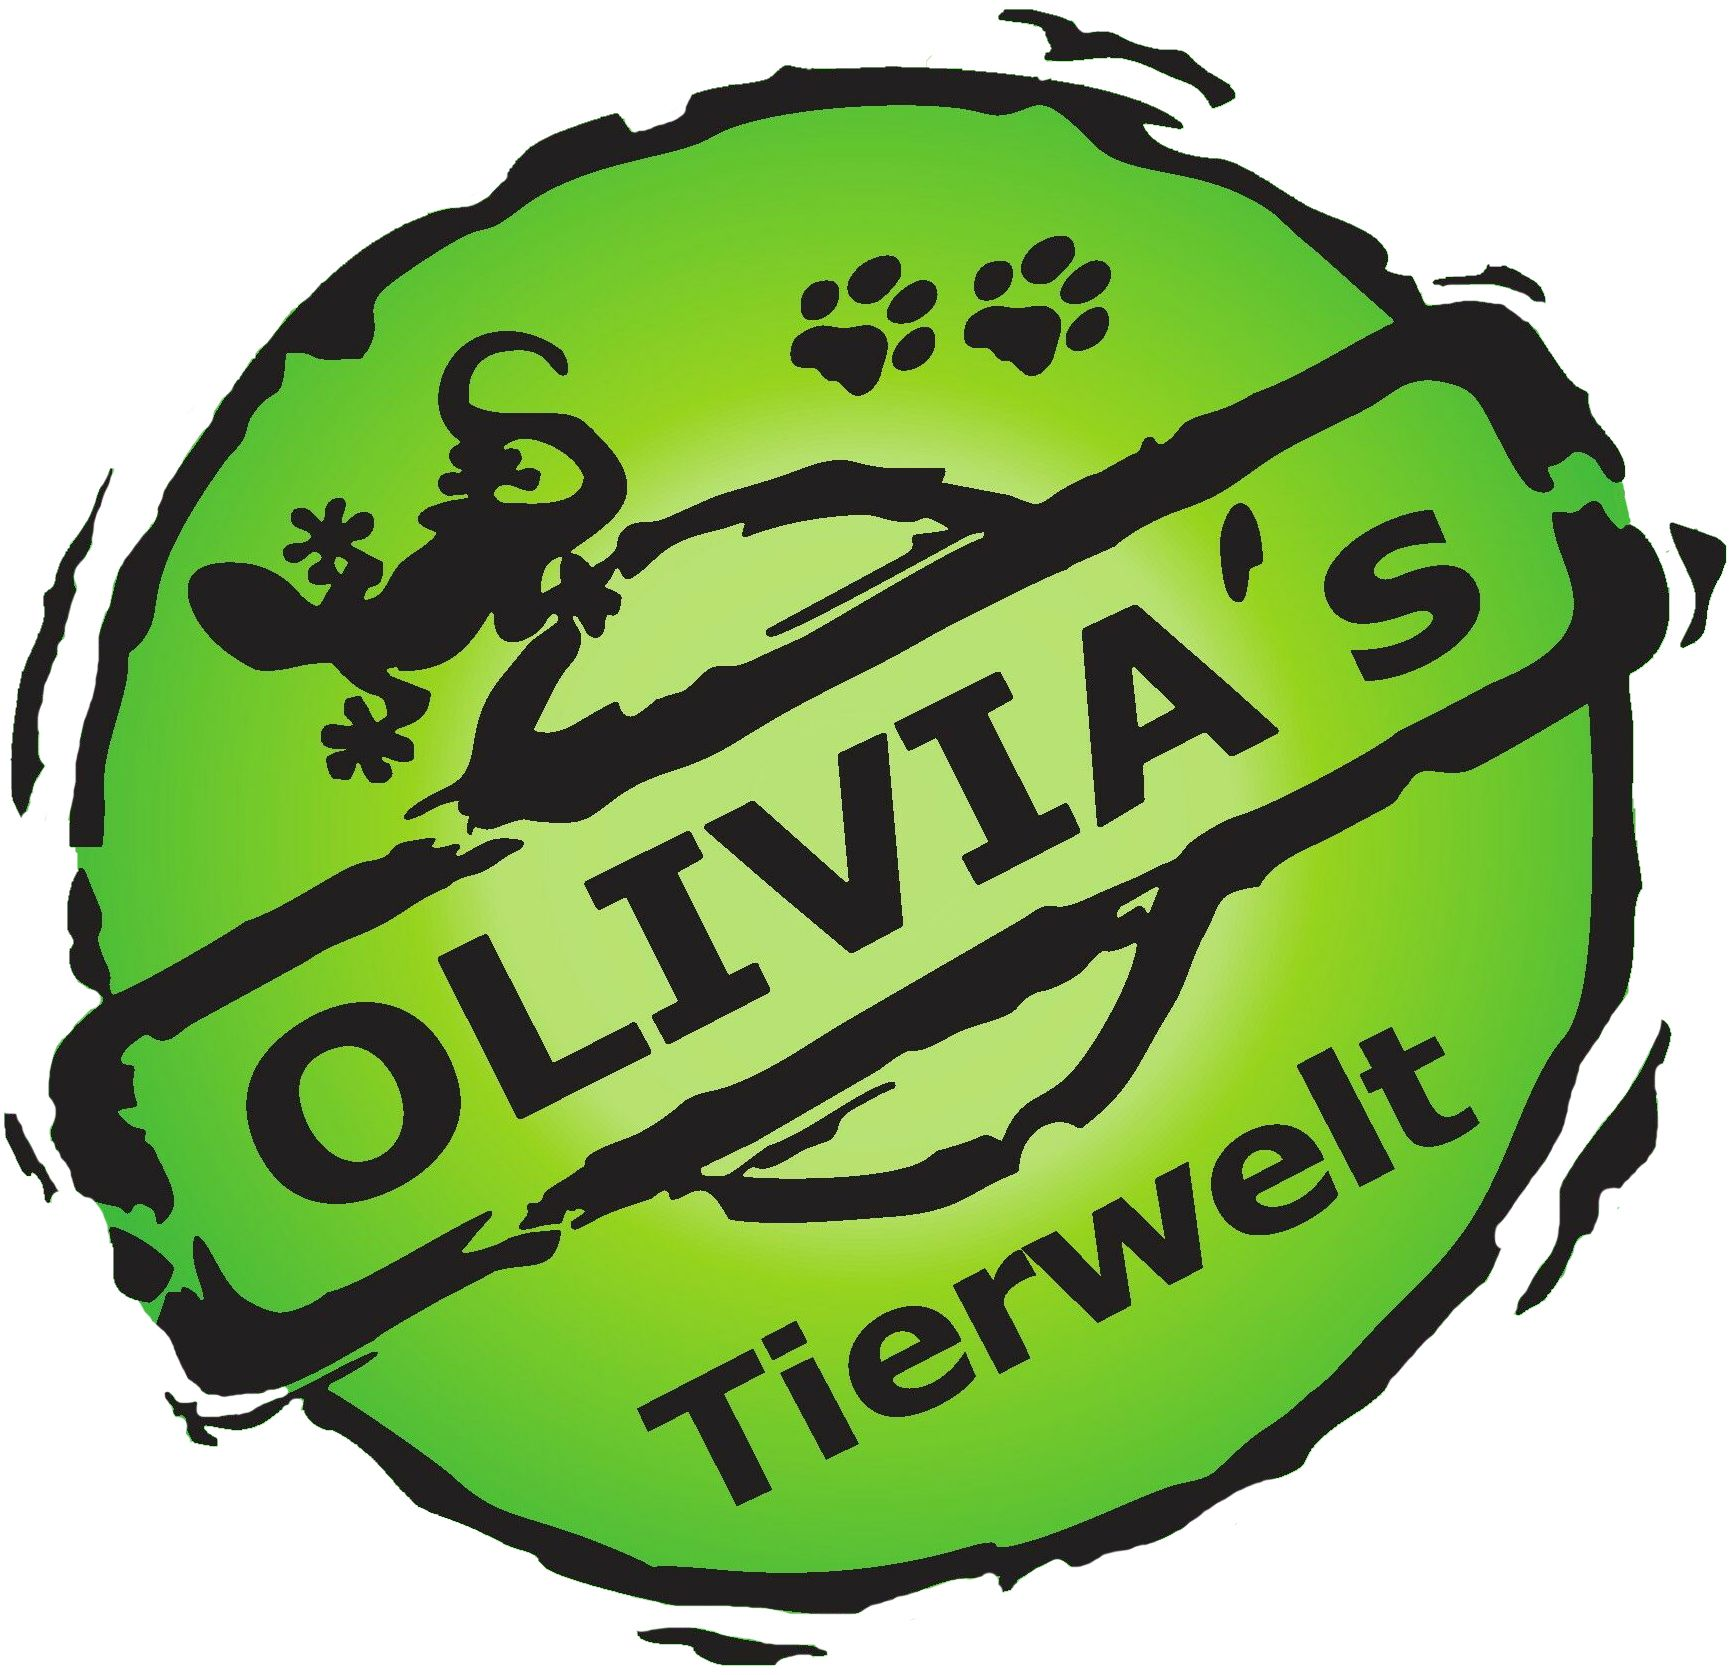 Olivia's Tierwelt